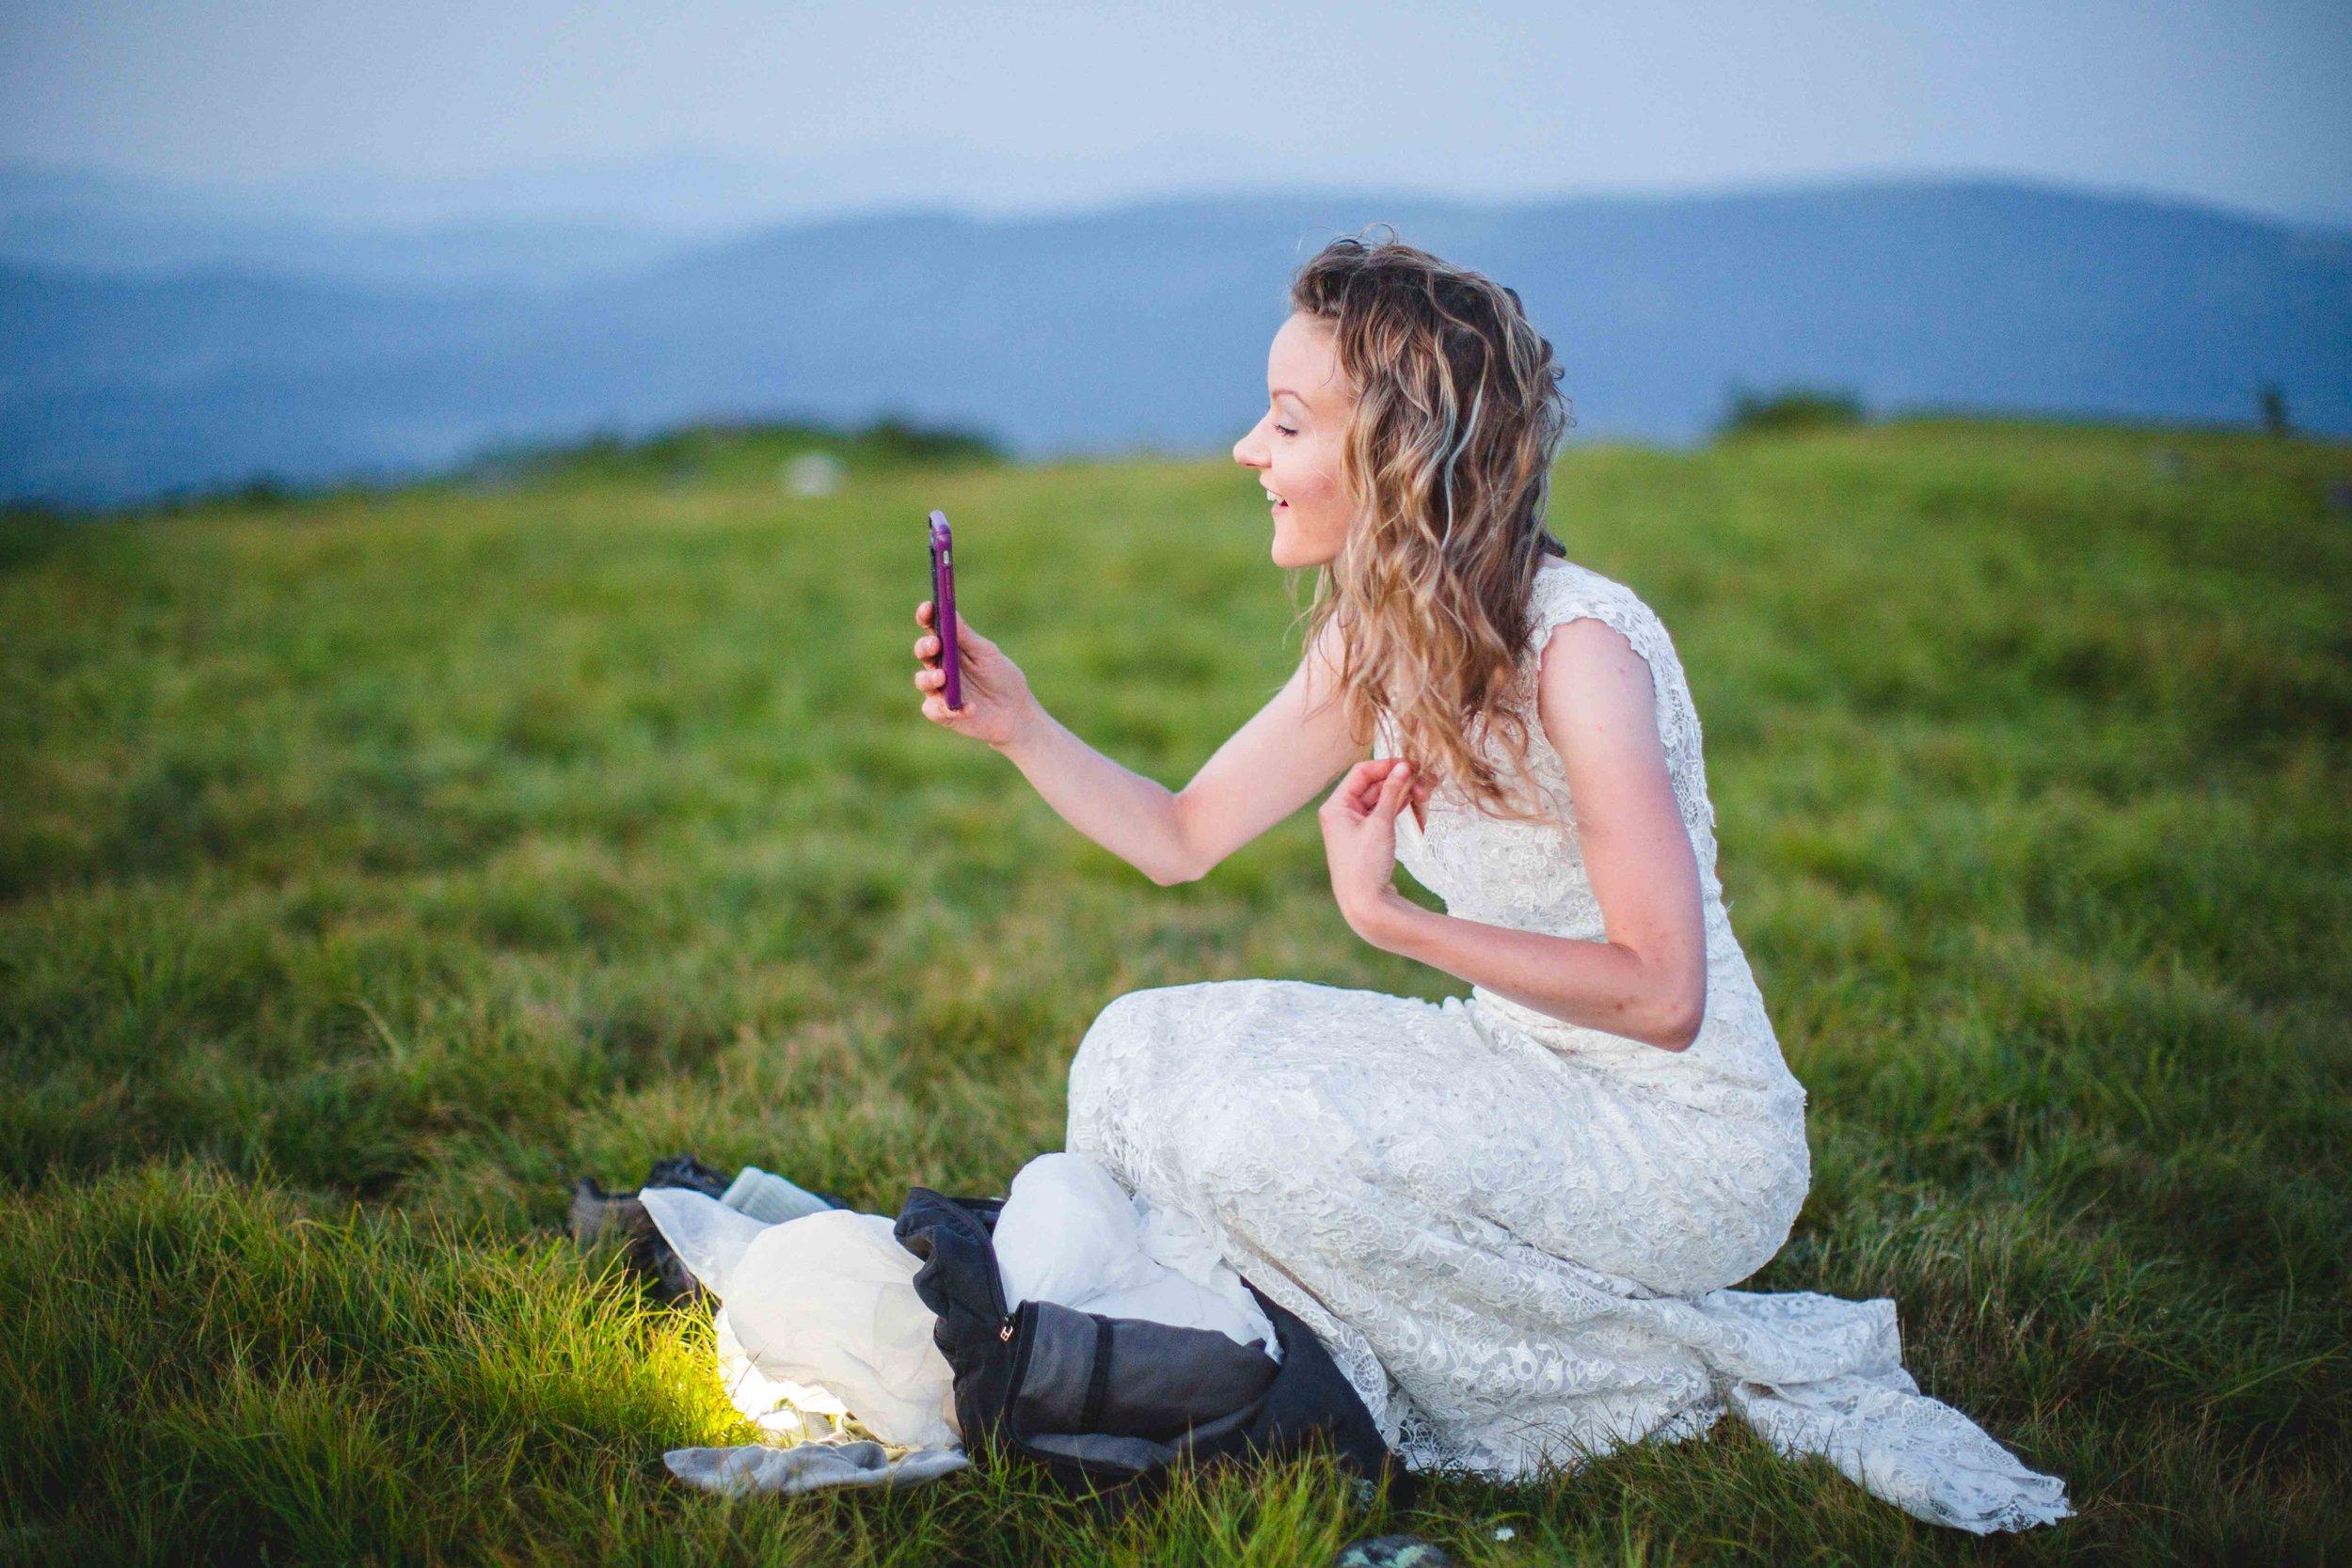 north-carolina-elopement-photographer-5.jpg